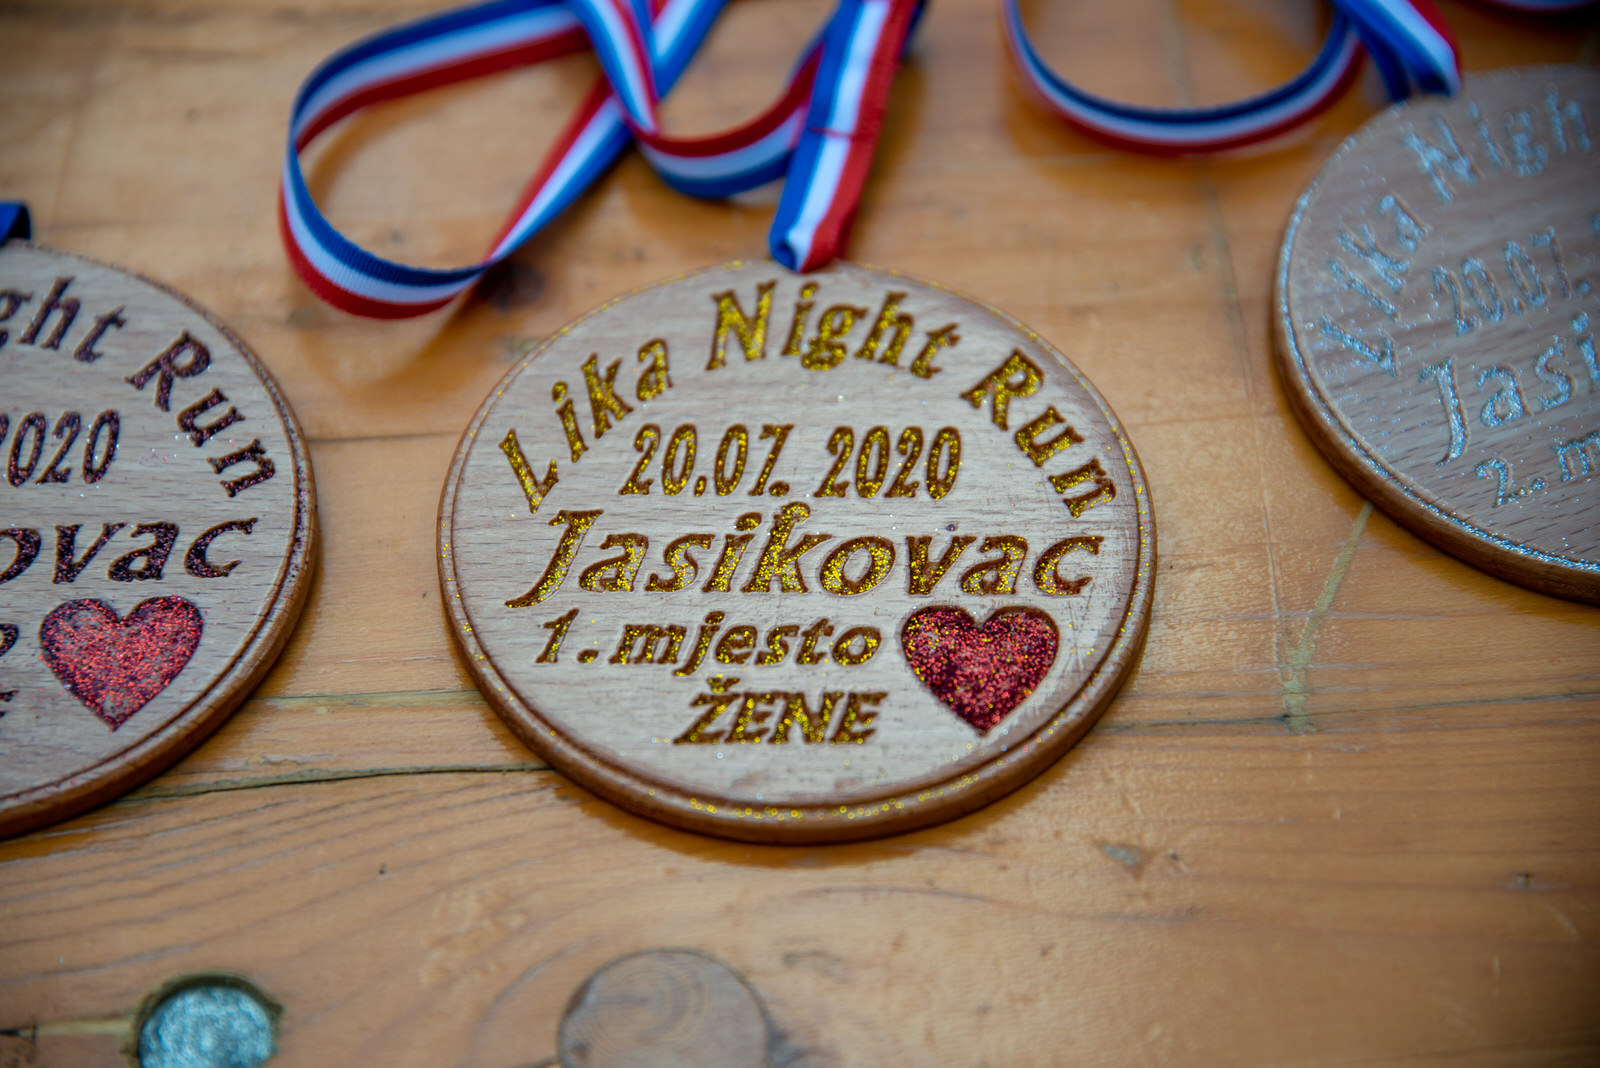 likaclub_lika night run_jasikovac_7_2020 (5)